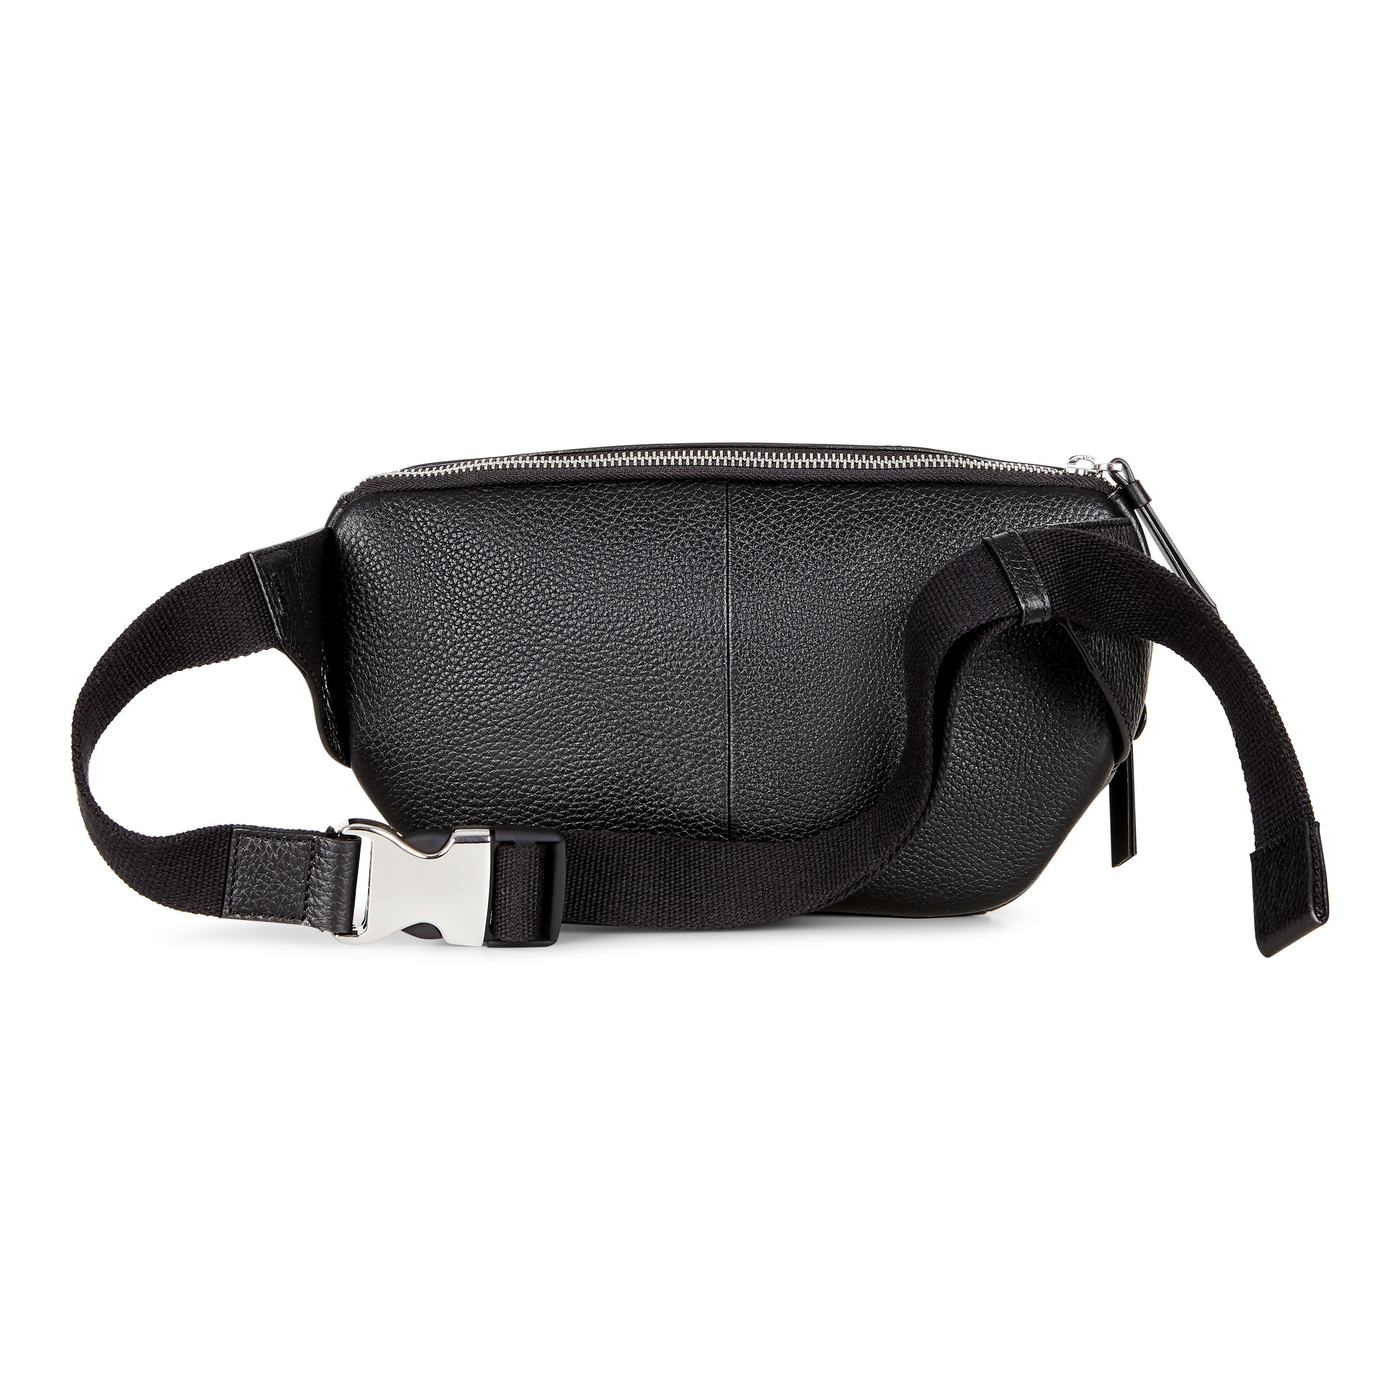 ECCO SP3 Sling Bag